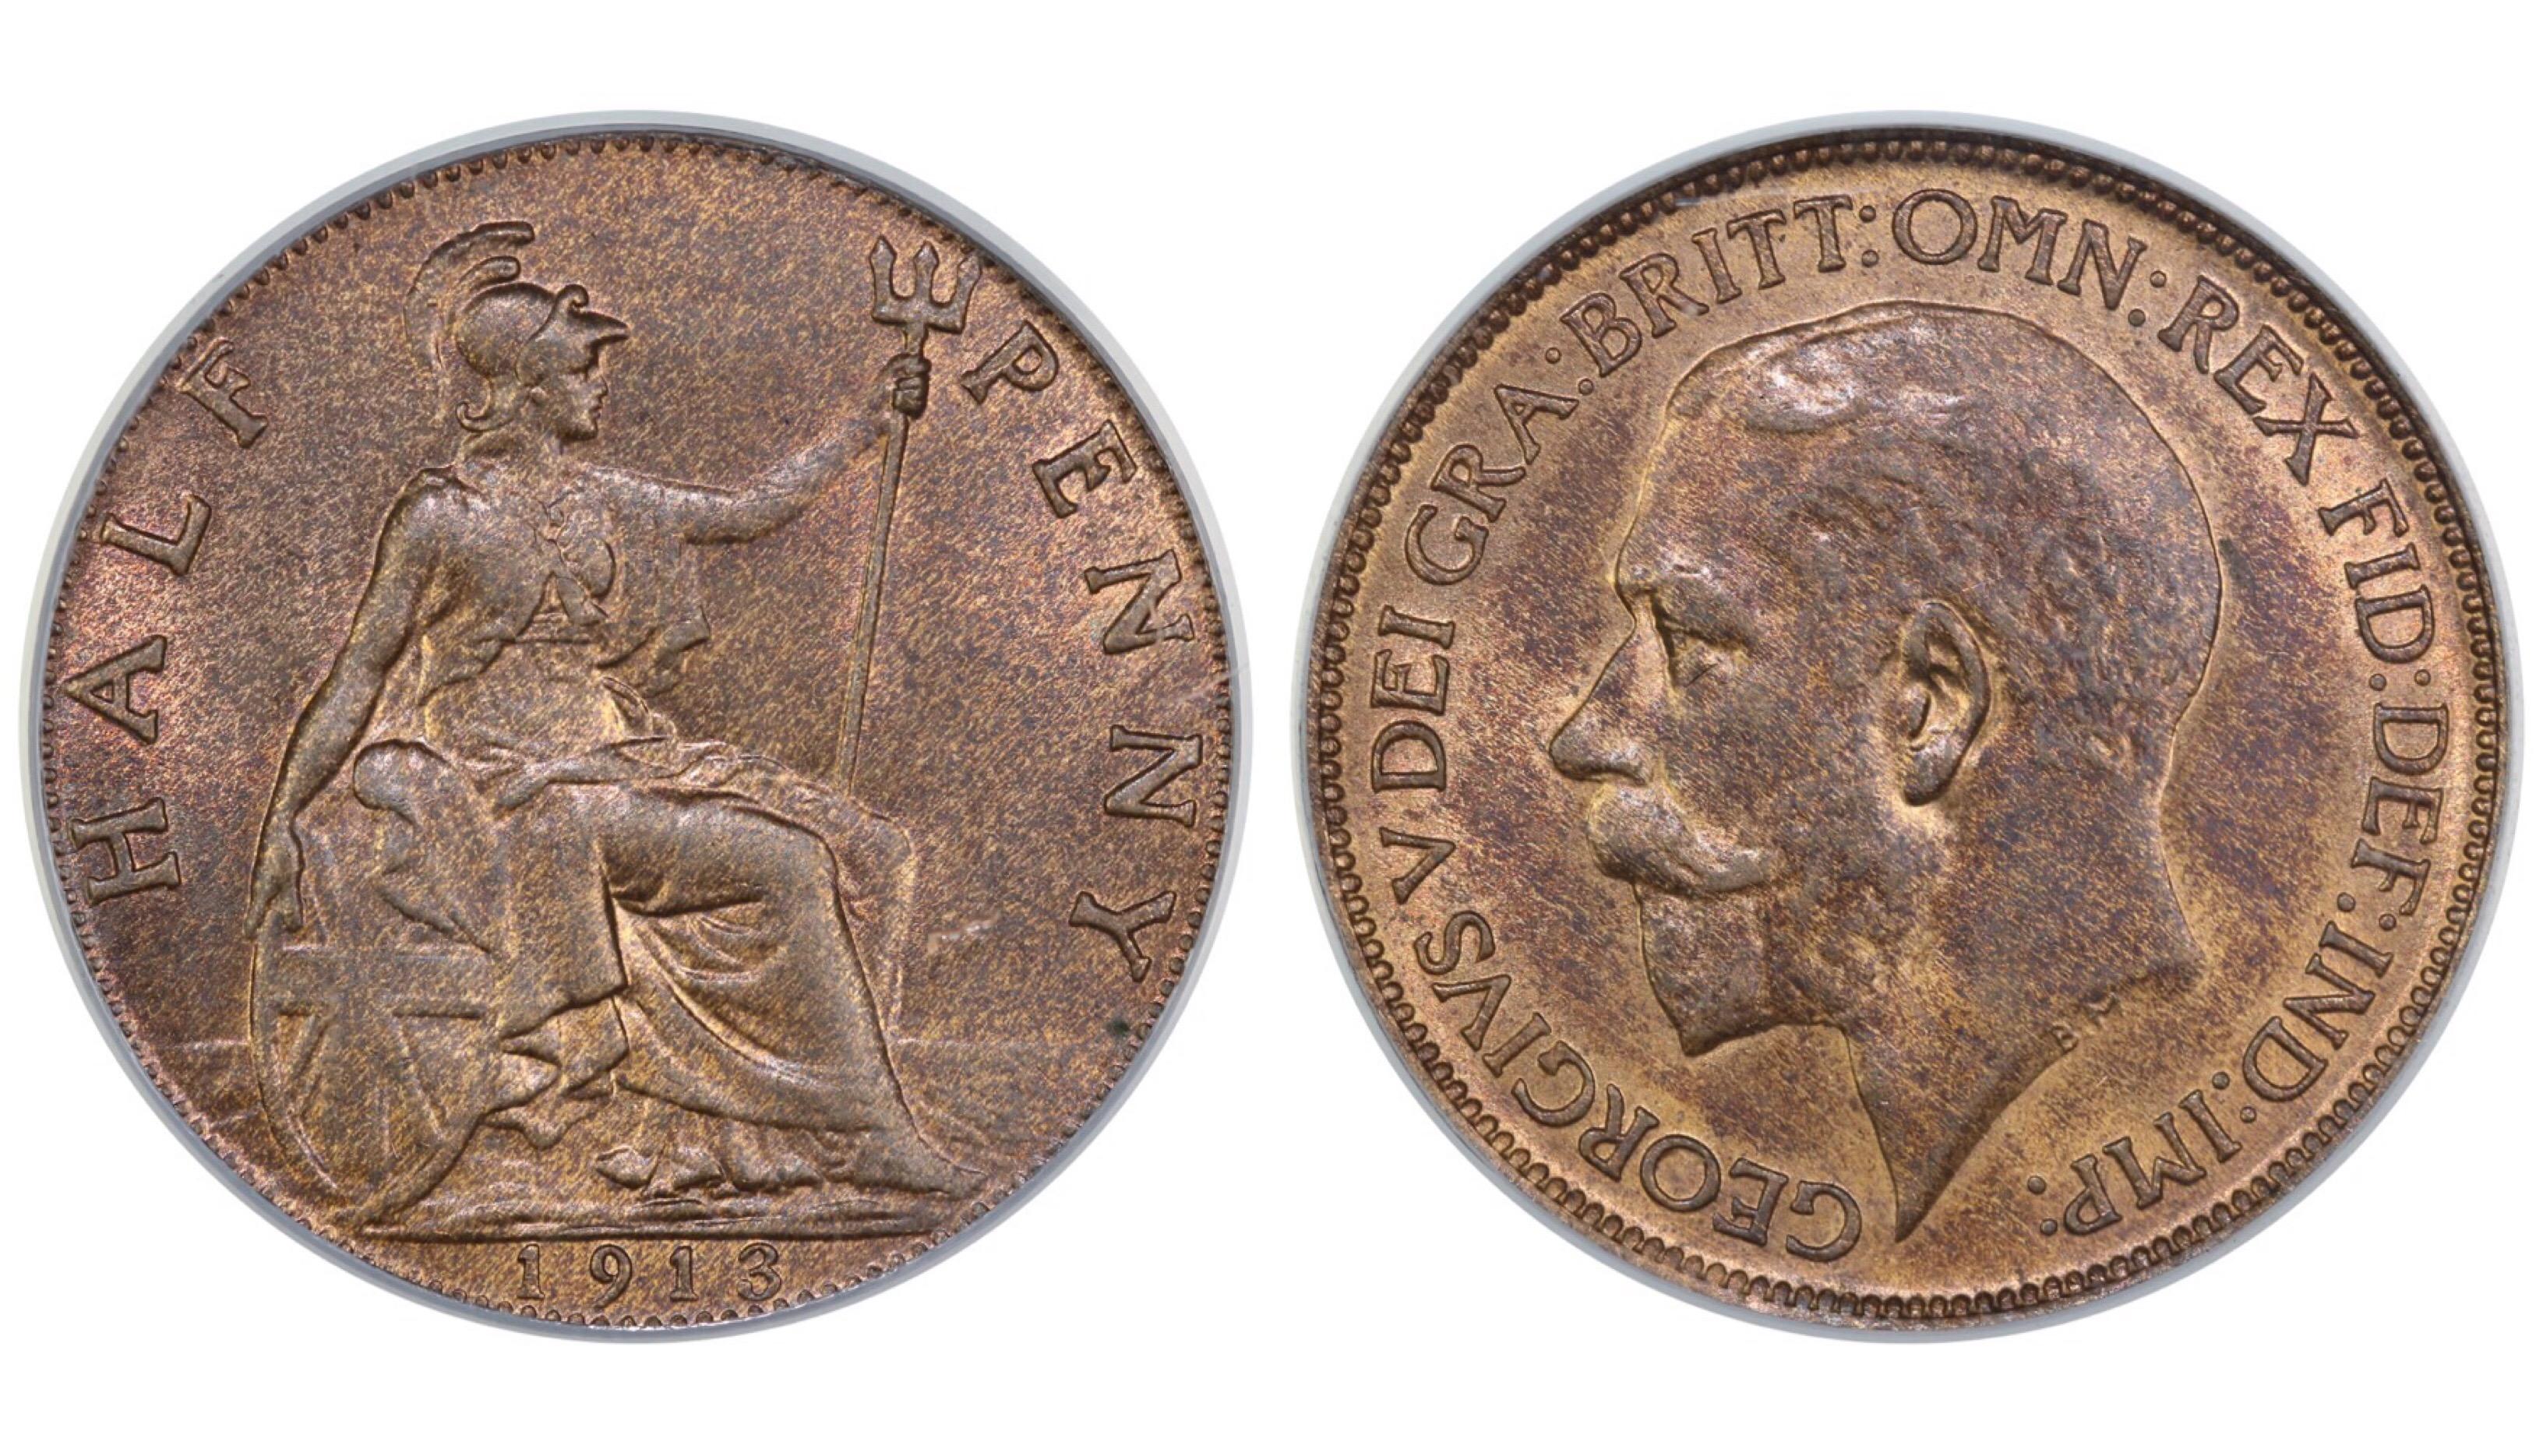 1913 Halfpenny, CGS 78, George V, Freeman 392, UIN 22160